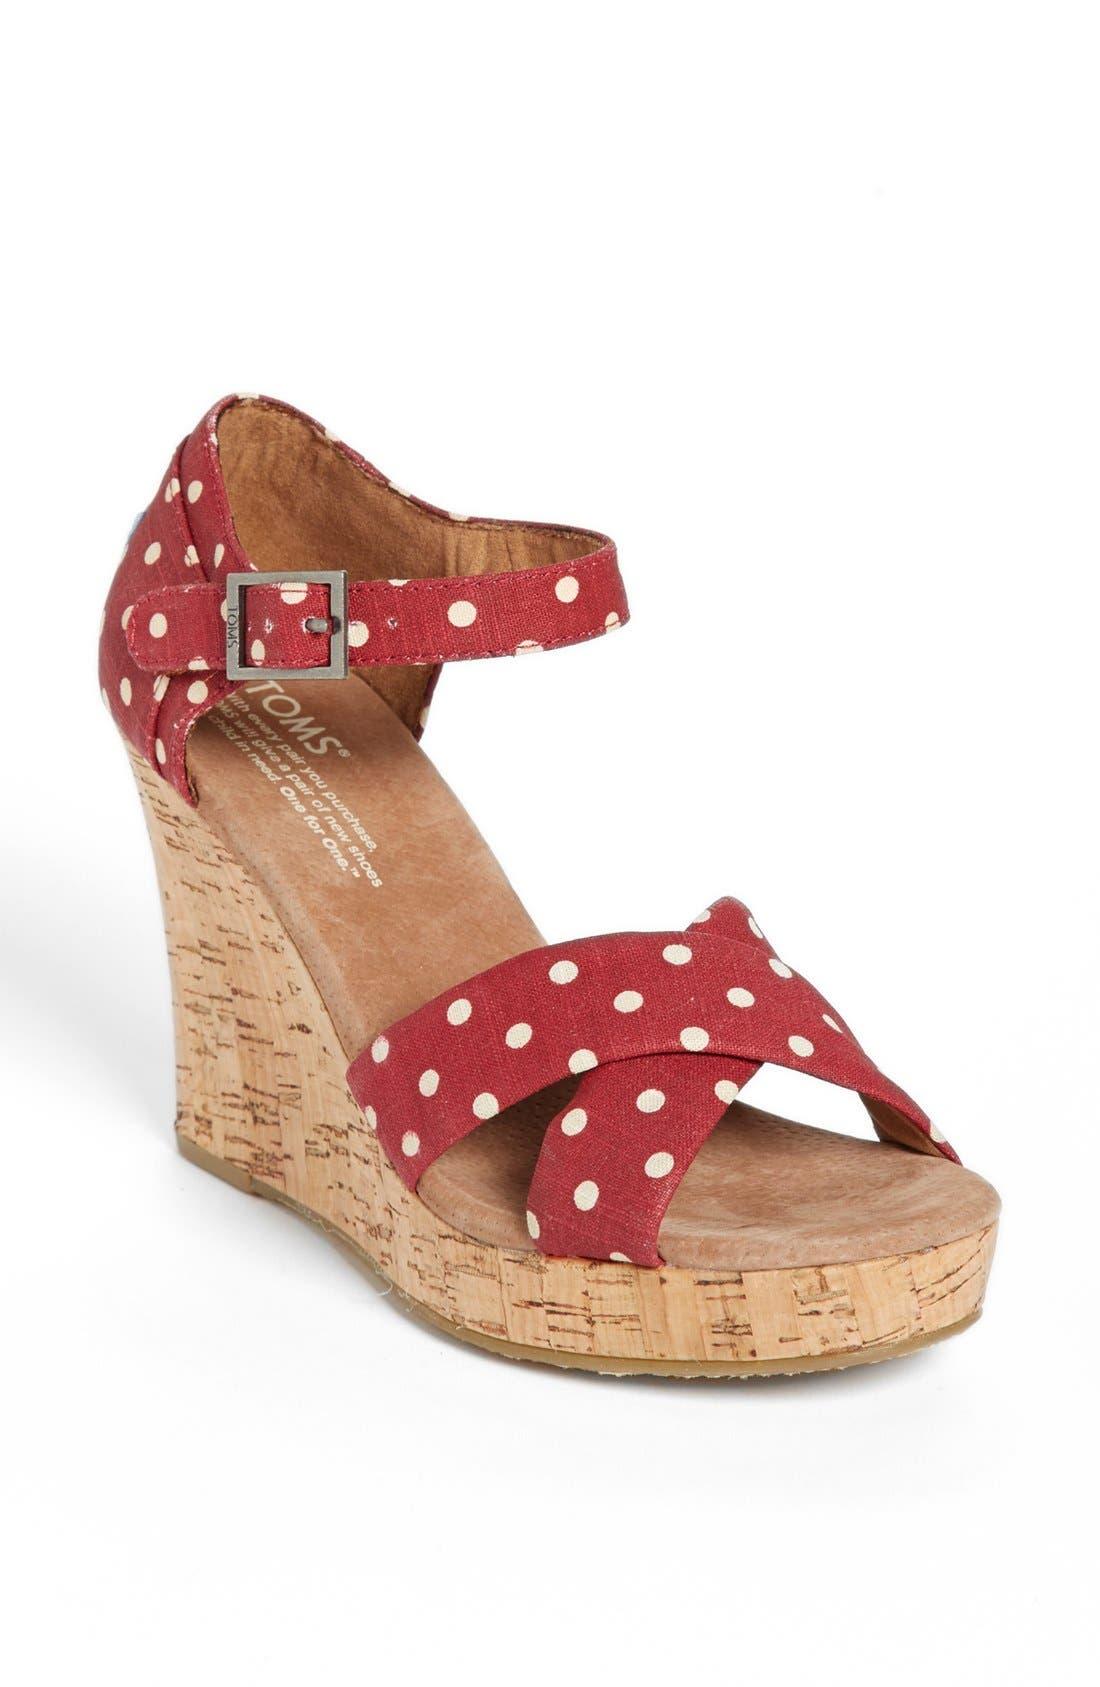 Main Image - TOMS Polka Dot Linen Woven Wedge Sandal